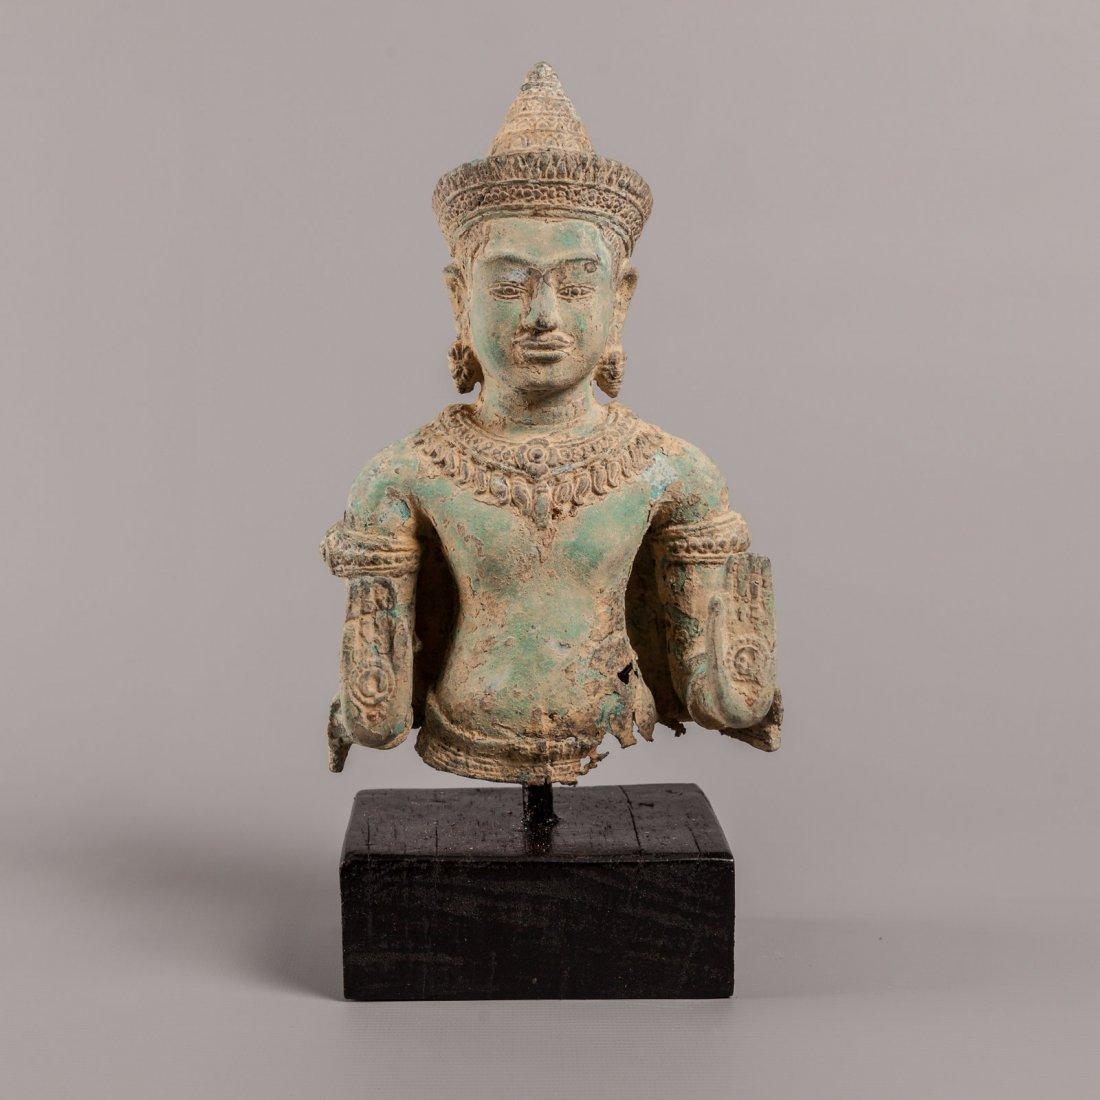 Antique Style Standing Cambodia Bronze Buddha